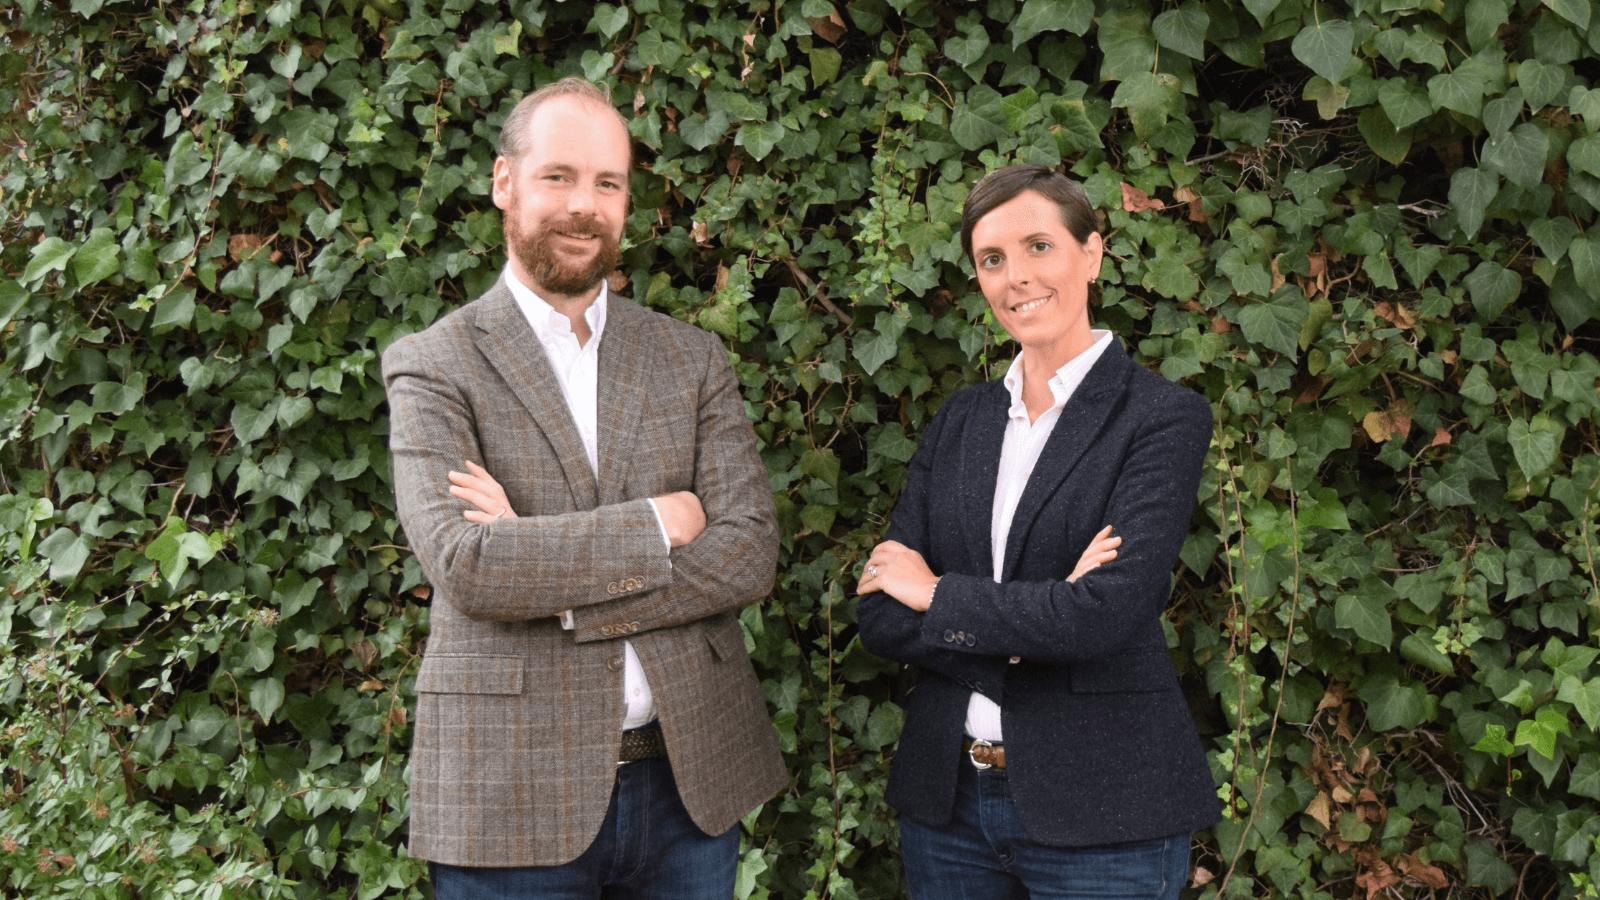 Cledara Raises $3.4m Seed - A Note From Cristina Vila, Founder & CEO @ Cledara